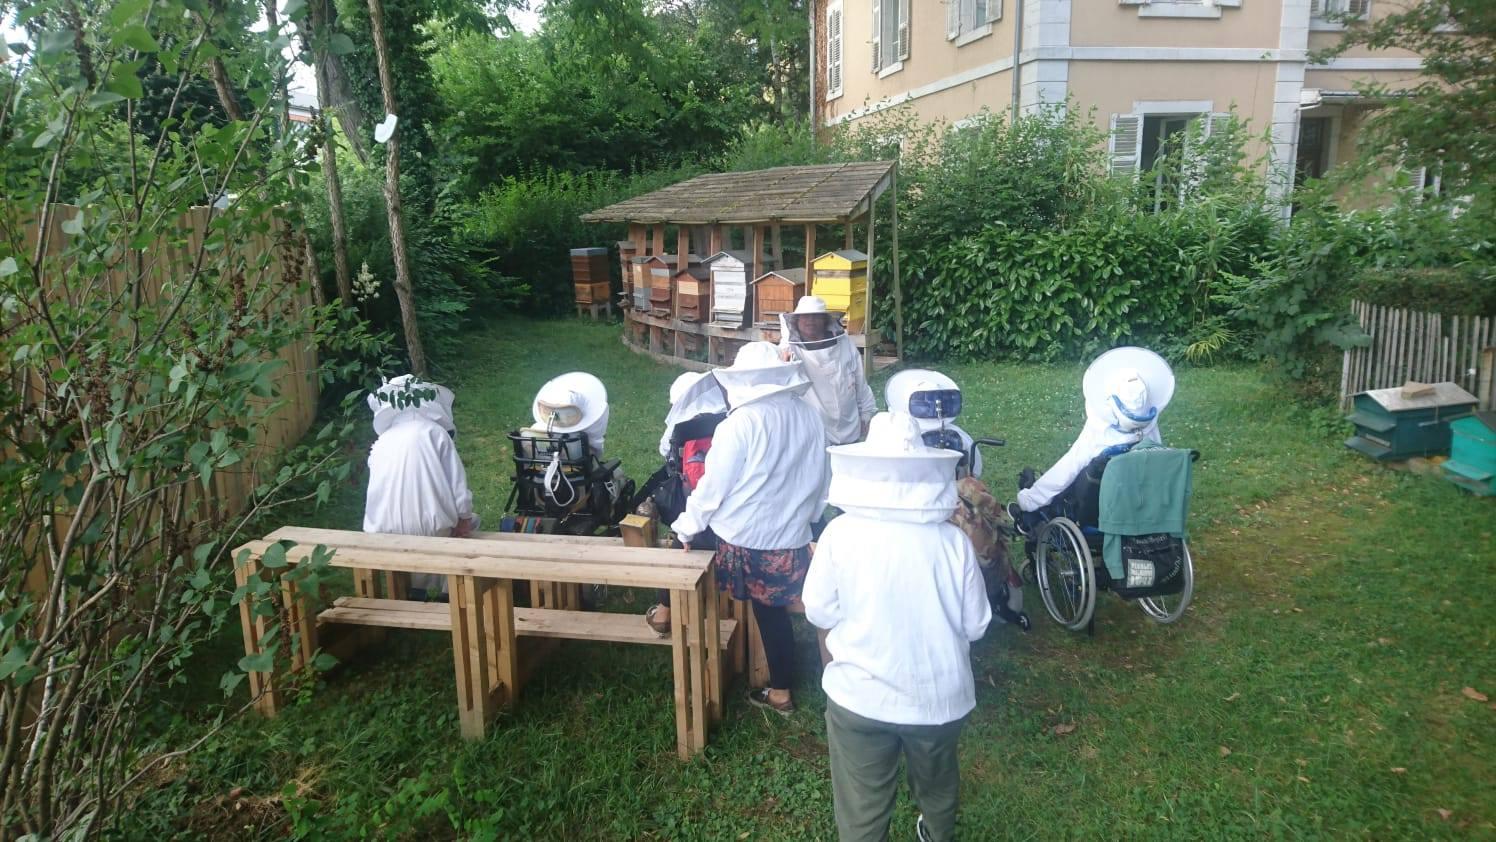 - Rucher du Haras d'Annecy - 19, rue Guillaume Fichet, 74000 Annecy, Jeudi 16 août 2018